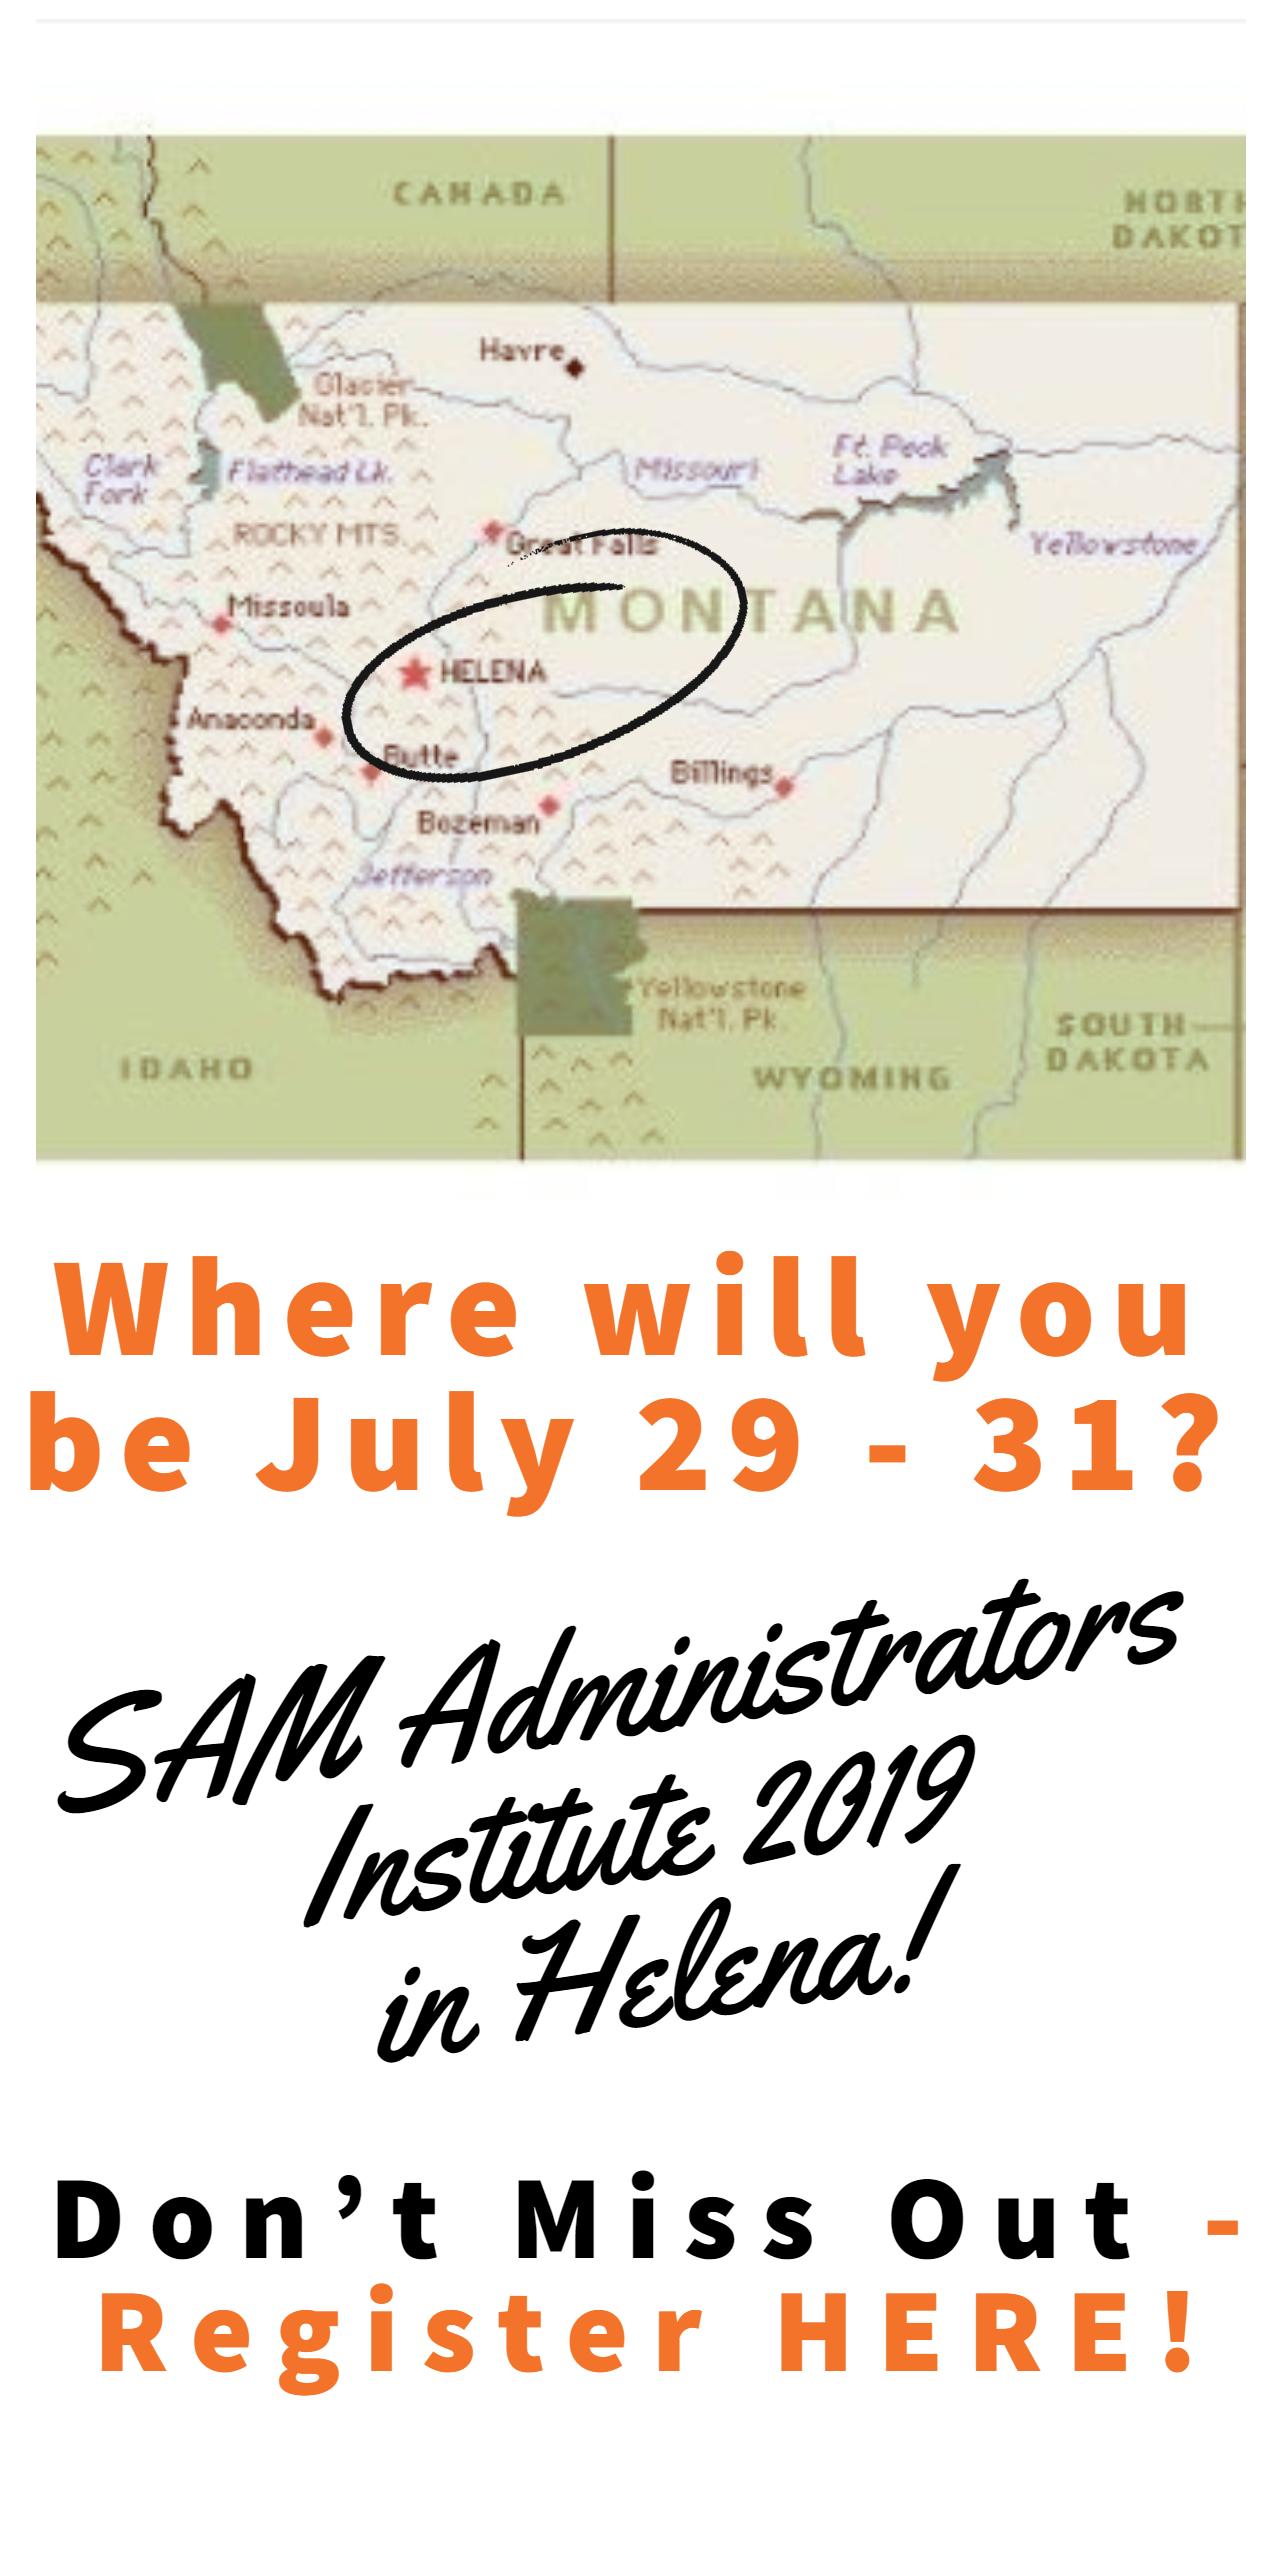 SAM_AI_2019-bulletin.png - 1.38 Mb